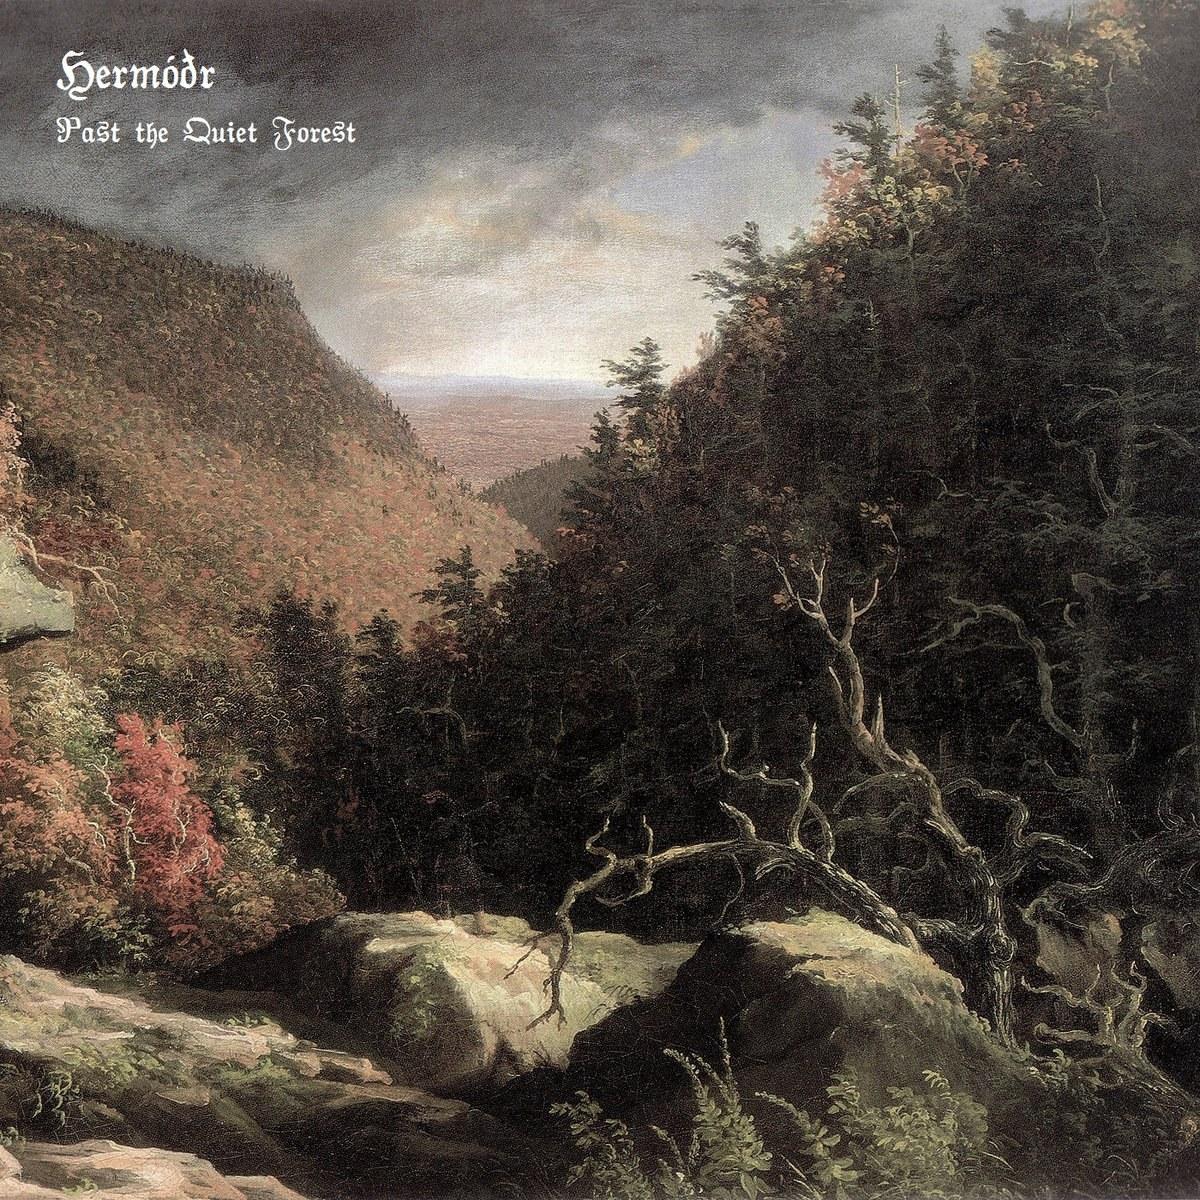 Reviews for Hermóðr - Past the Quiet Forest